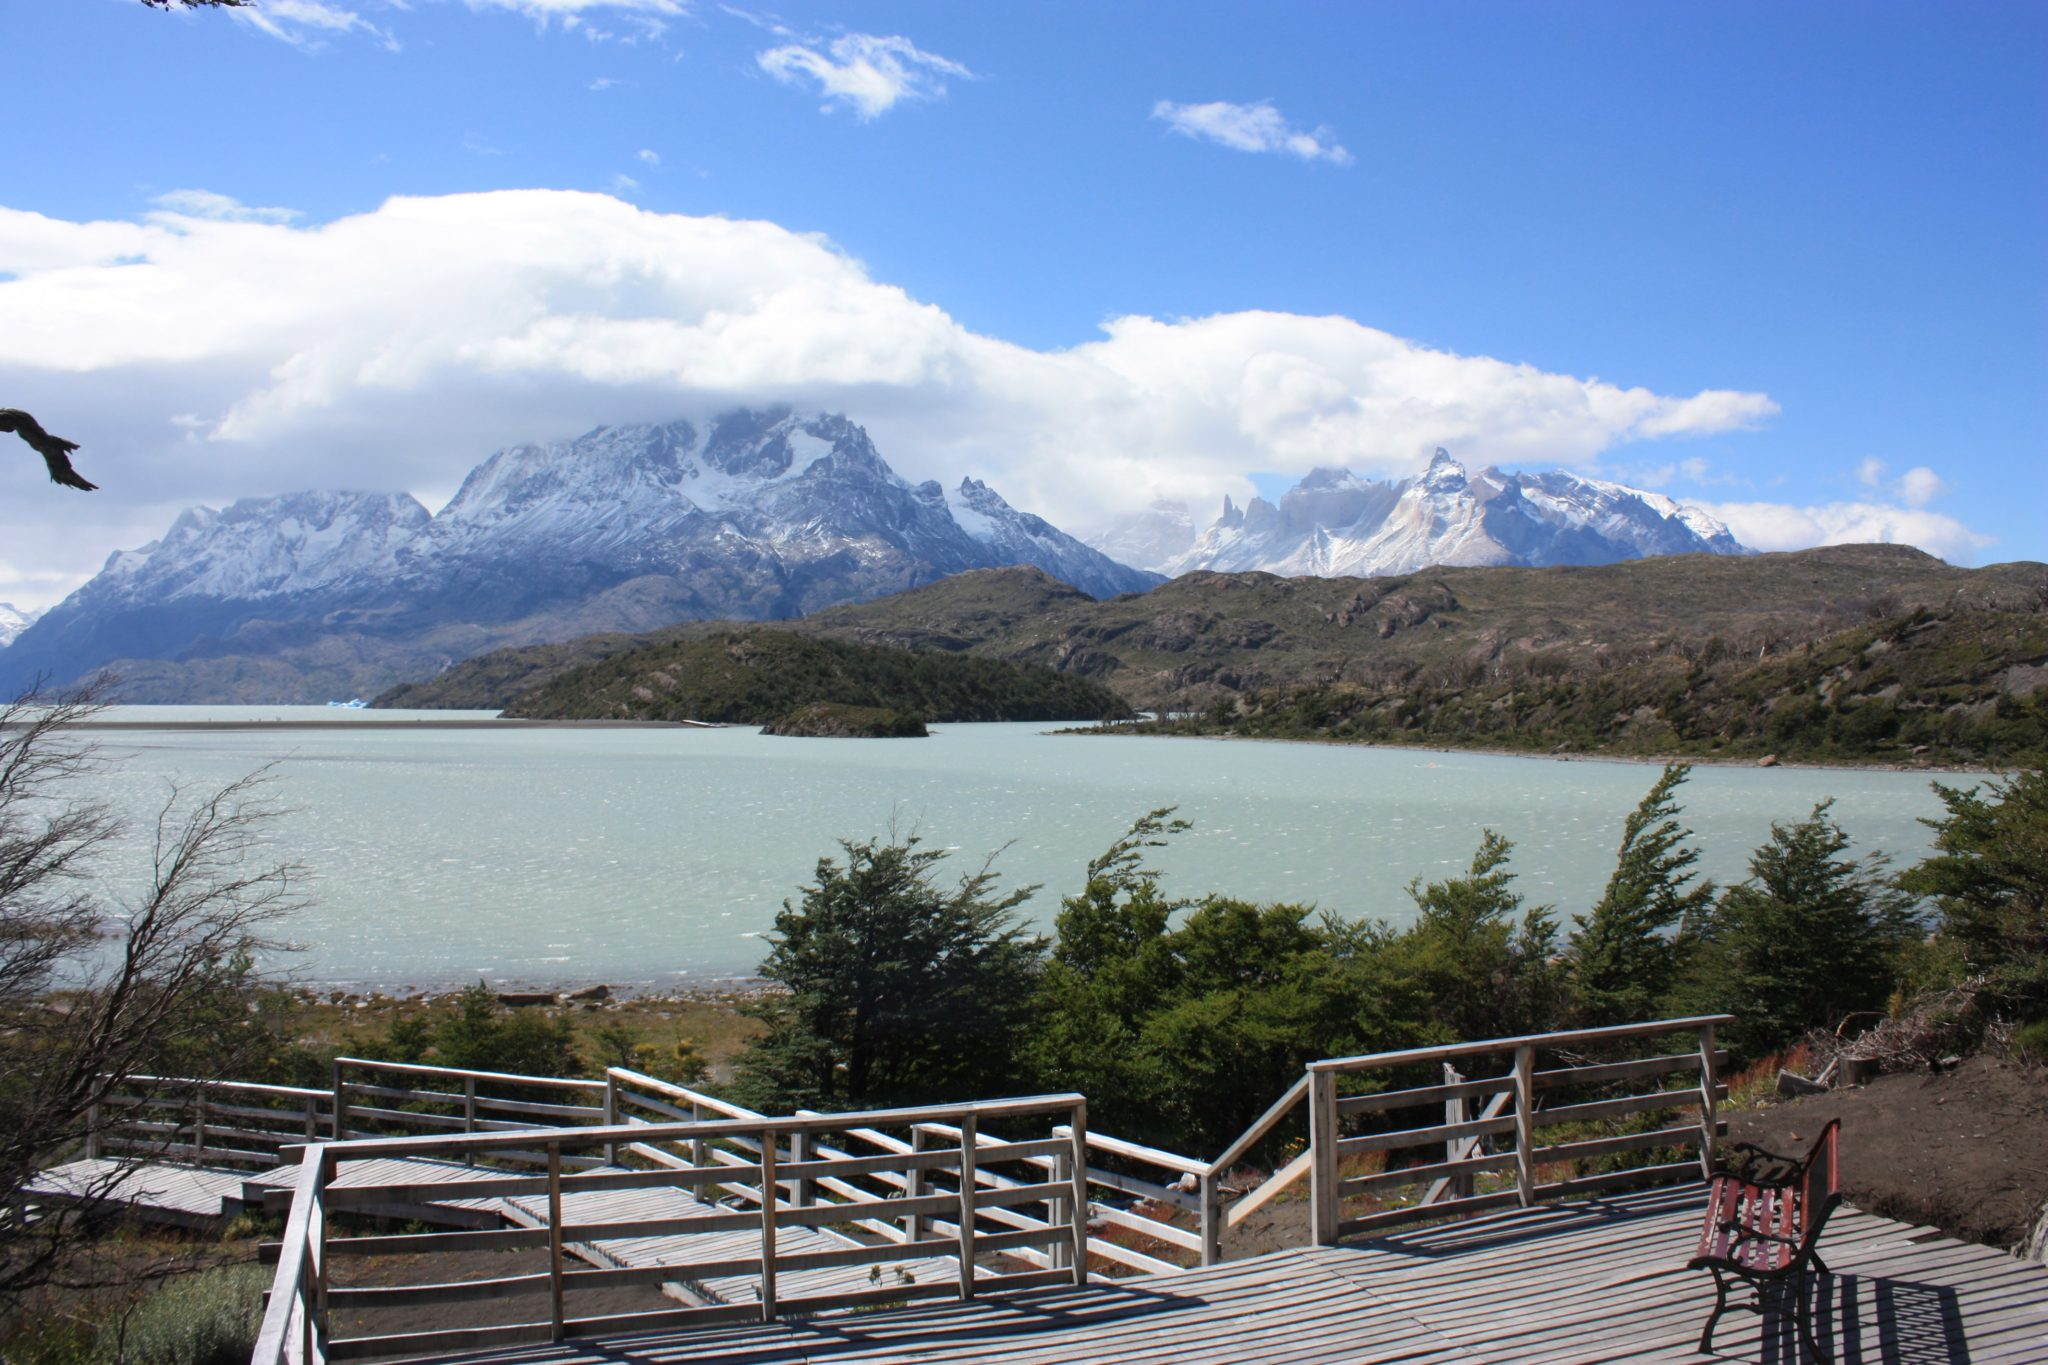 Torres del Paine lago grey glacier terrasse hotel grey patagonie chili